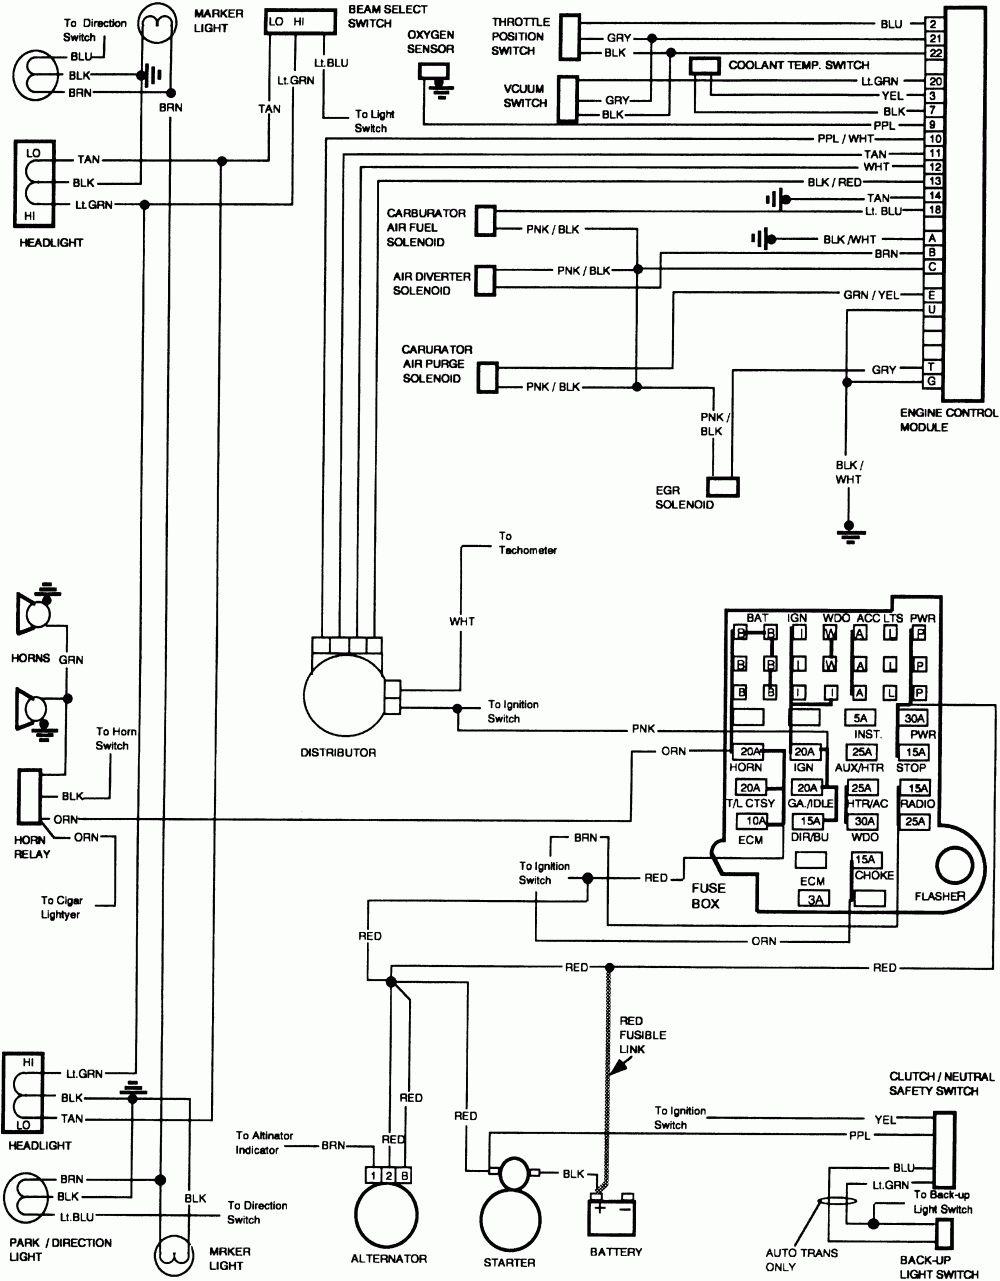 86 Chevy Truck Wiring Diagram Repair Guides Wiring Diagrams Wiring Diagrams  Autozone In 1986 Chevy Truck Wir… | 1985 chevy truck, 1986 chevy truck,  1979 chevy truck Pinterest